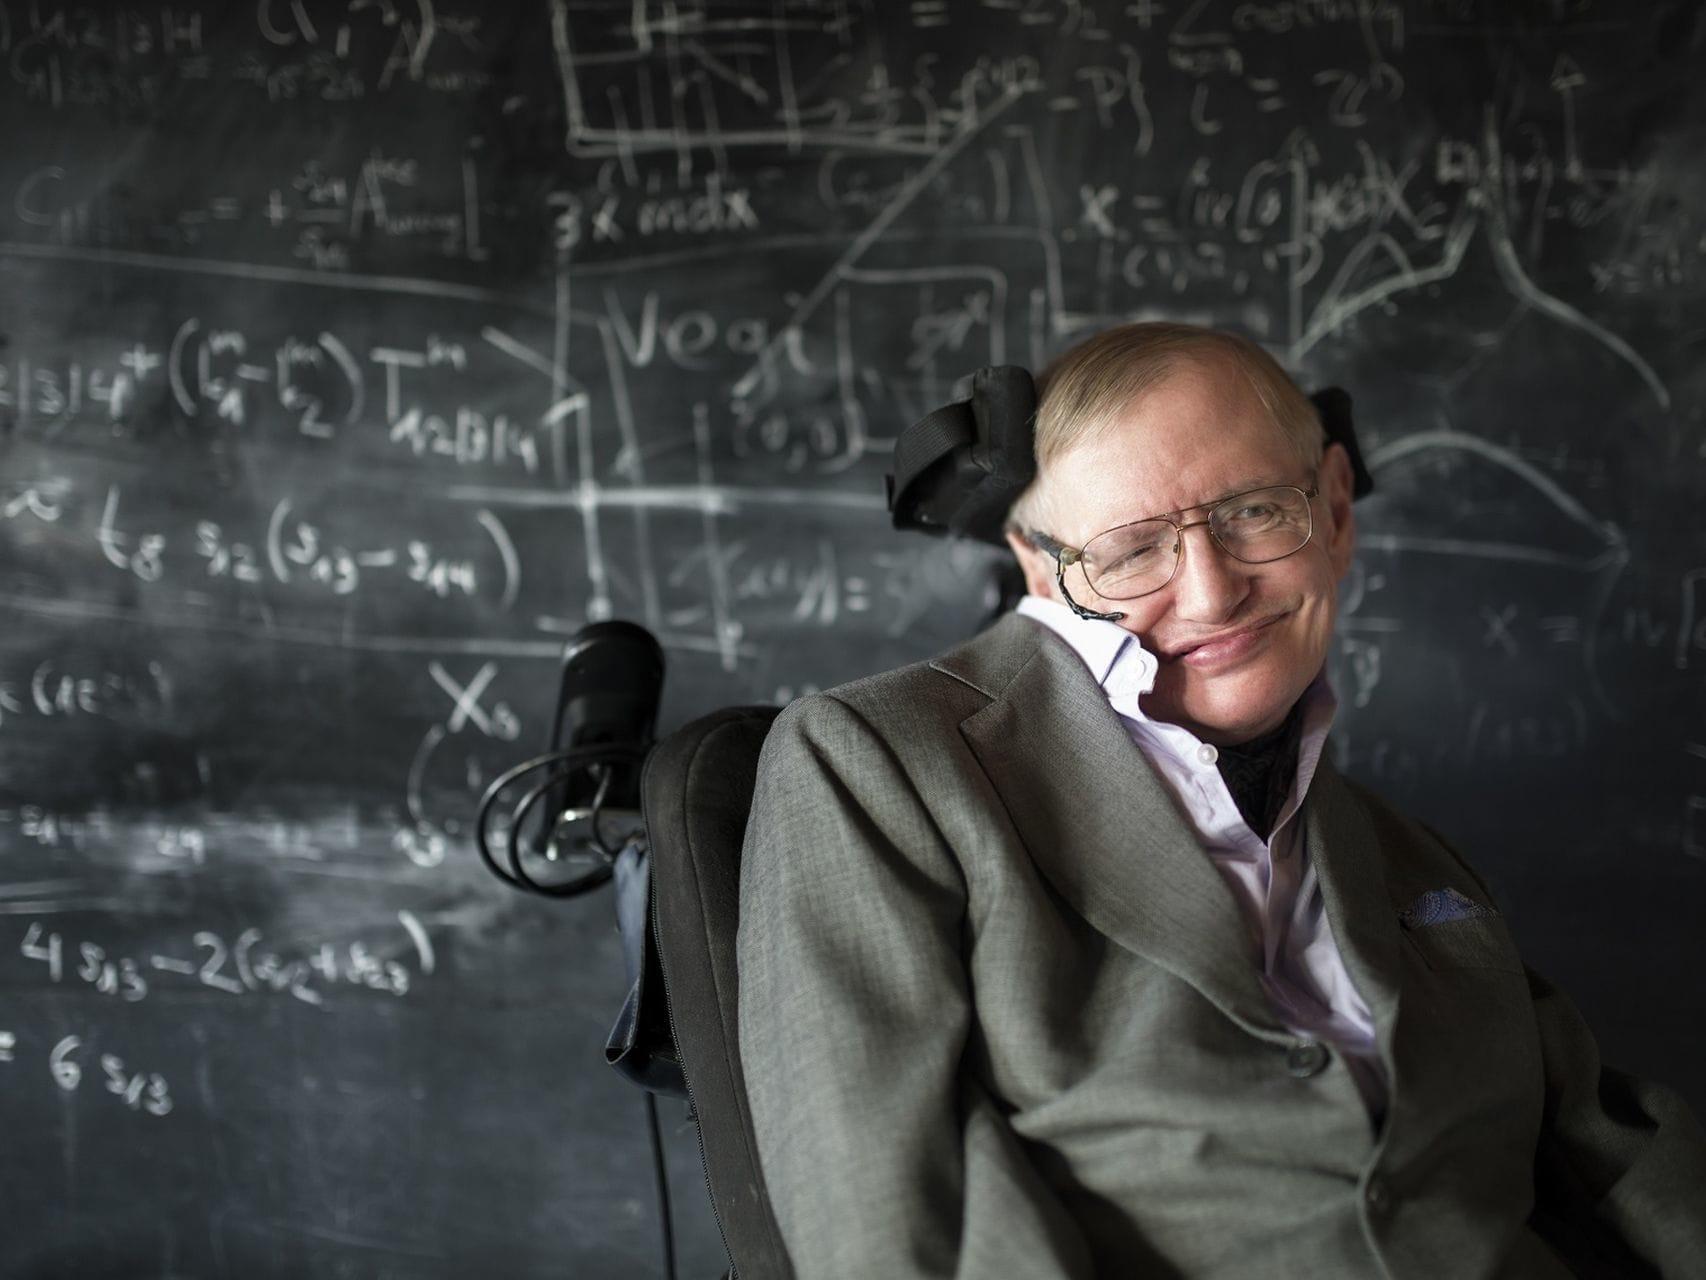 Top 10 Smartest People 2017: 10. Stephen Hawking